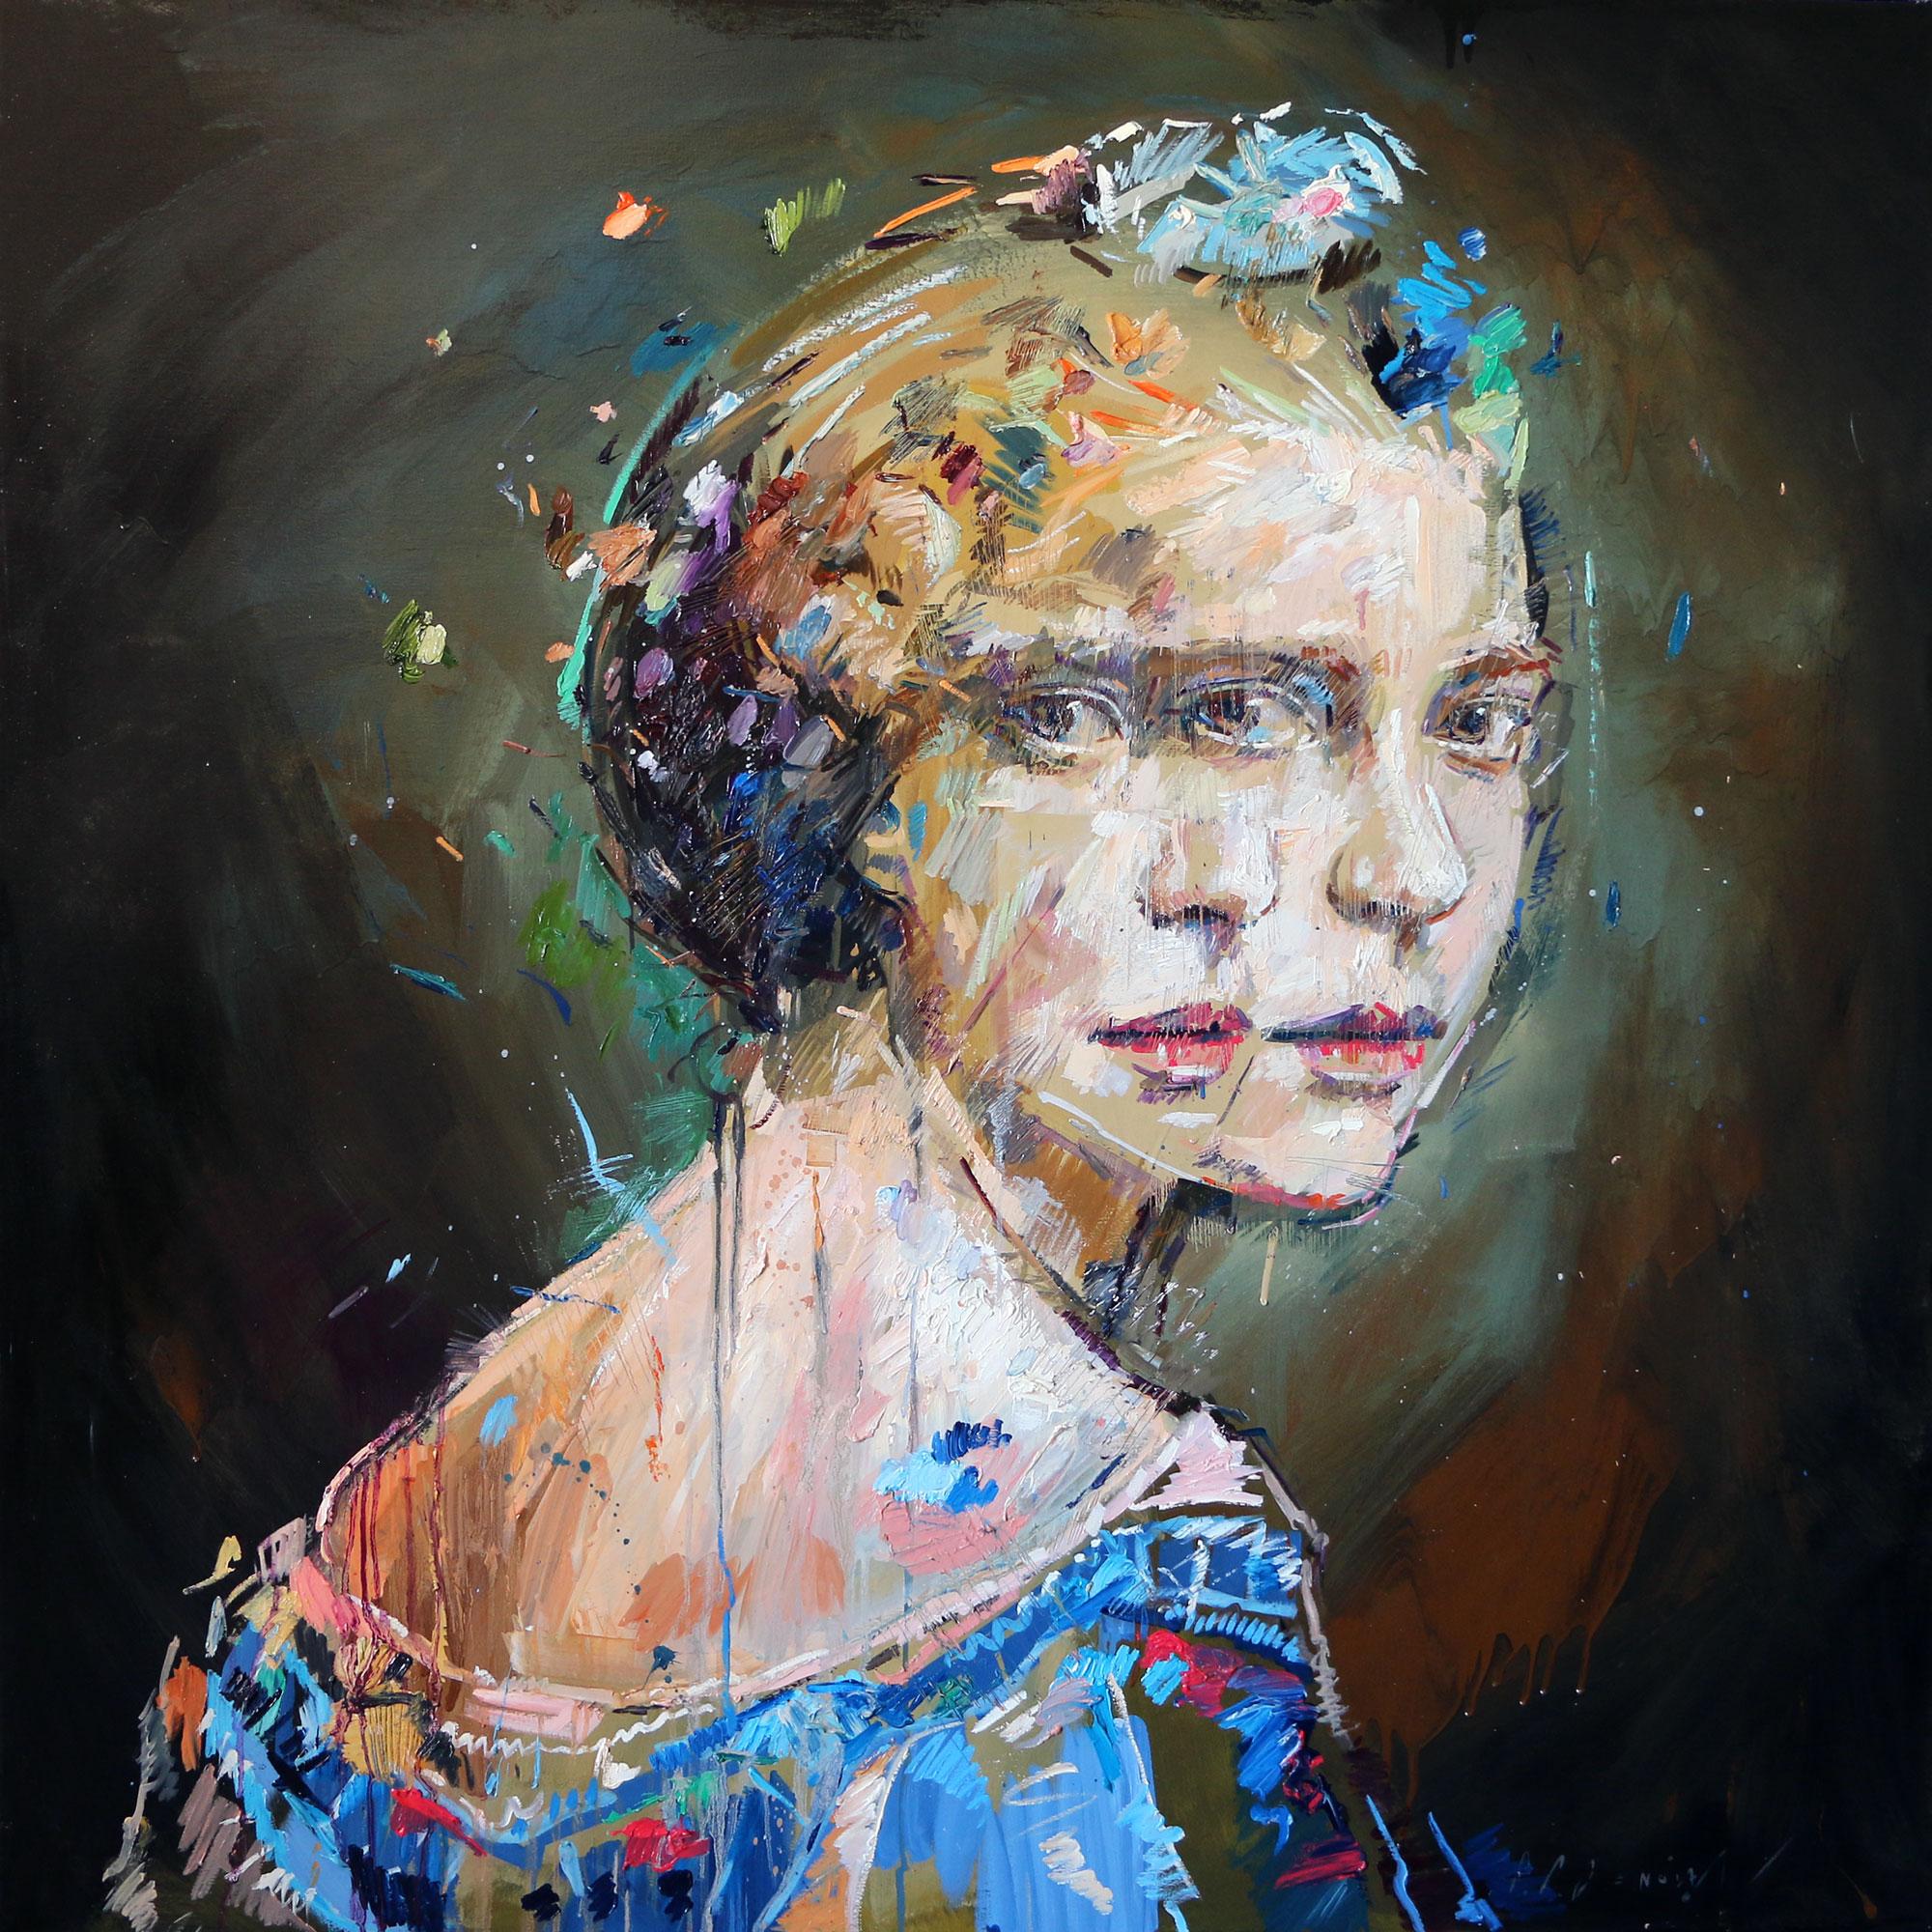 Rupture (Dorothea Poole). Oil on canvas.130cm x 130cm.